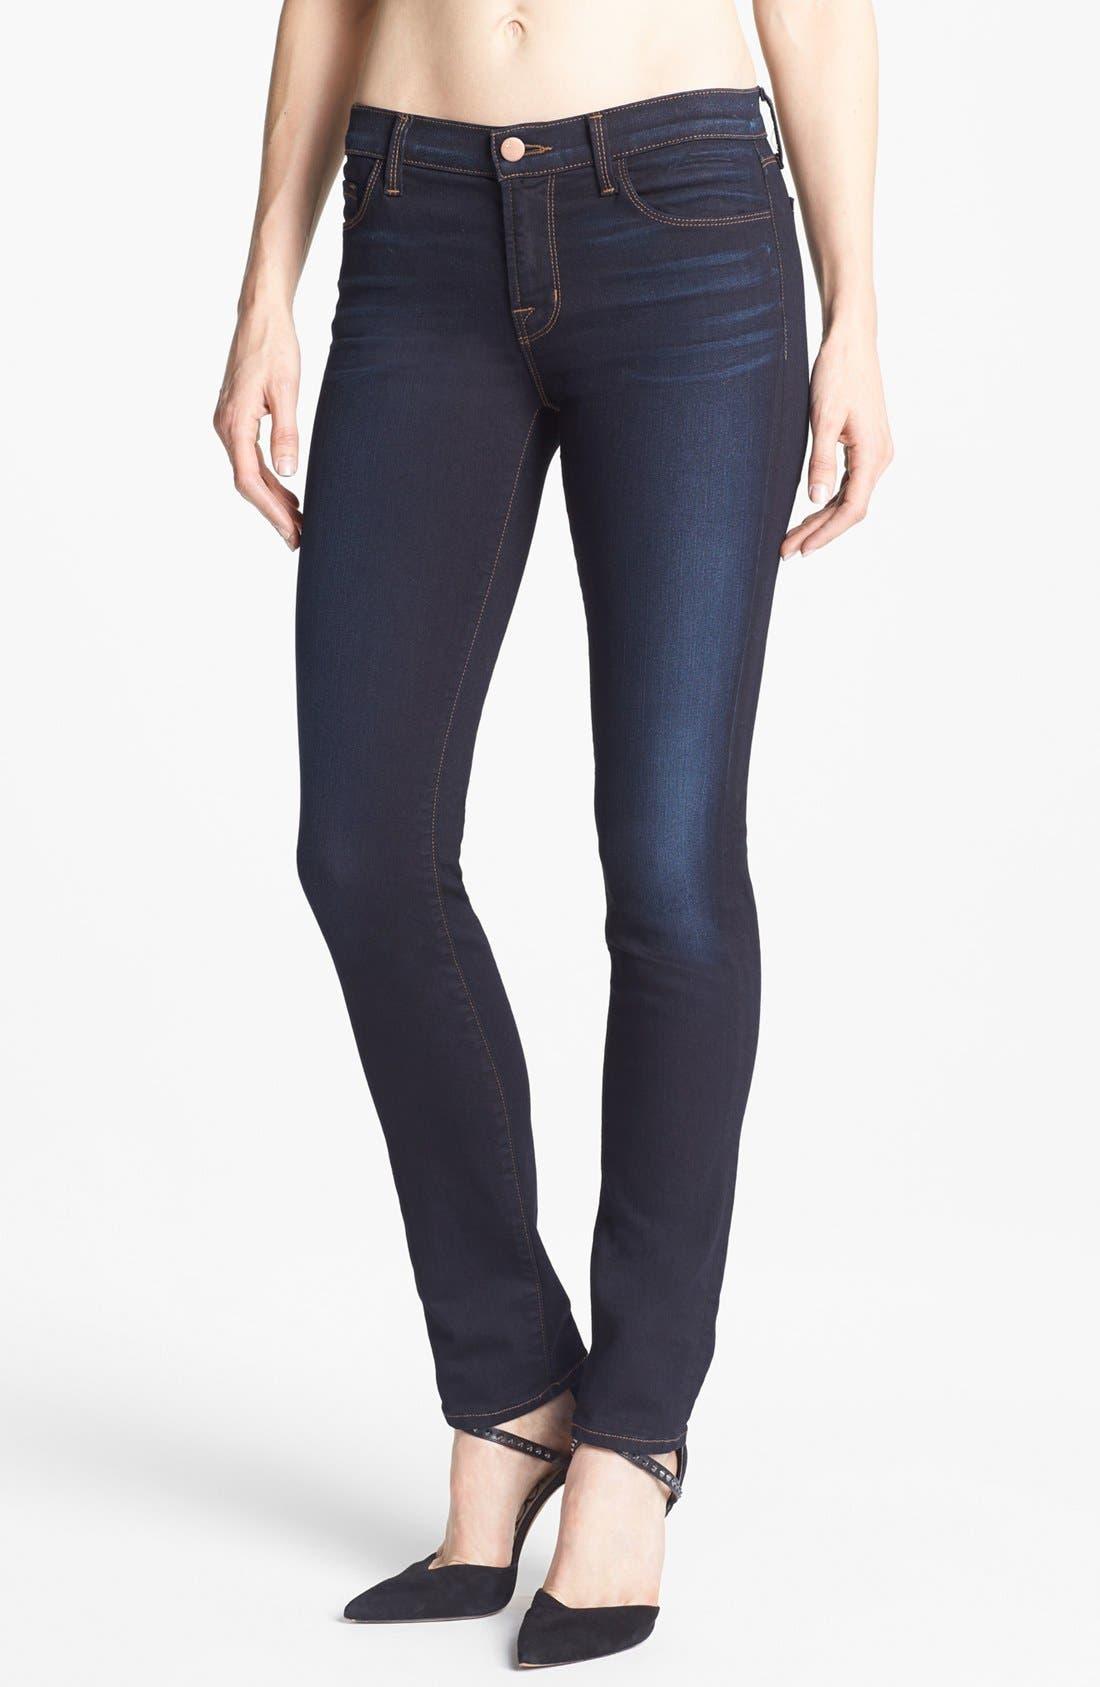 Alternate Image 1 Selected - J Brand '8112 Mid Rise Rail' Skinny Jeans (Atlantis)